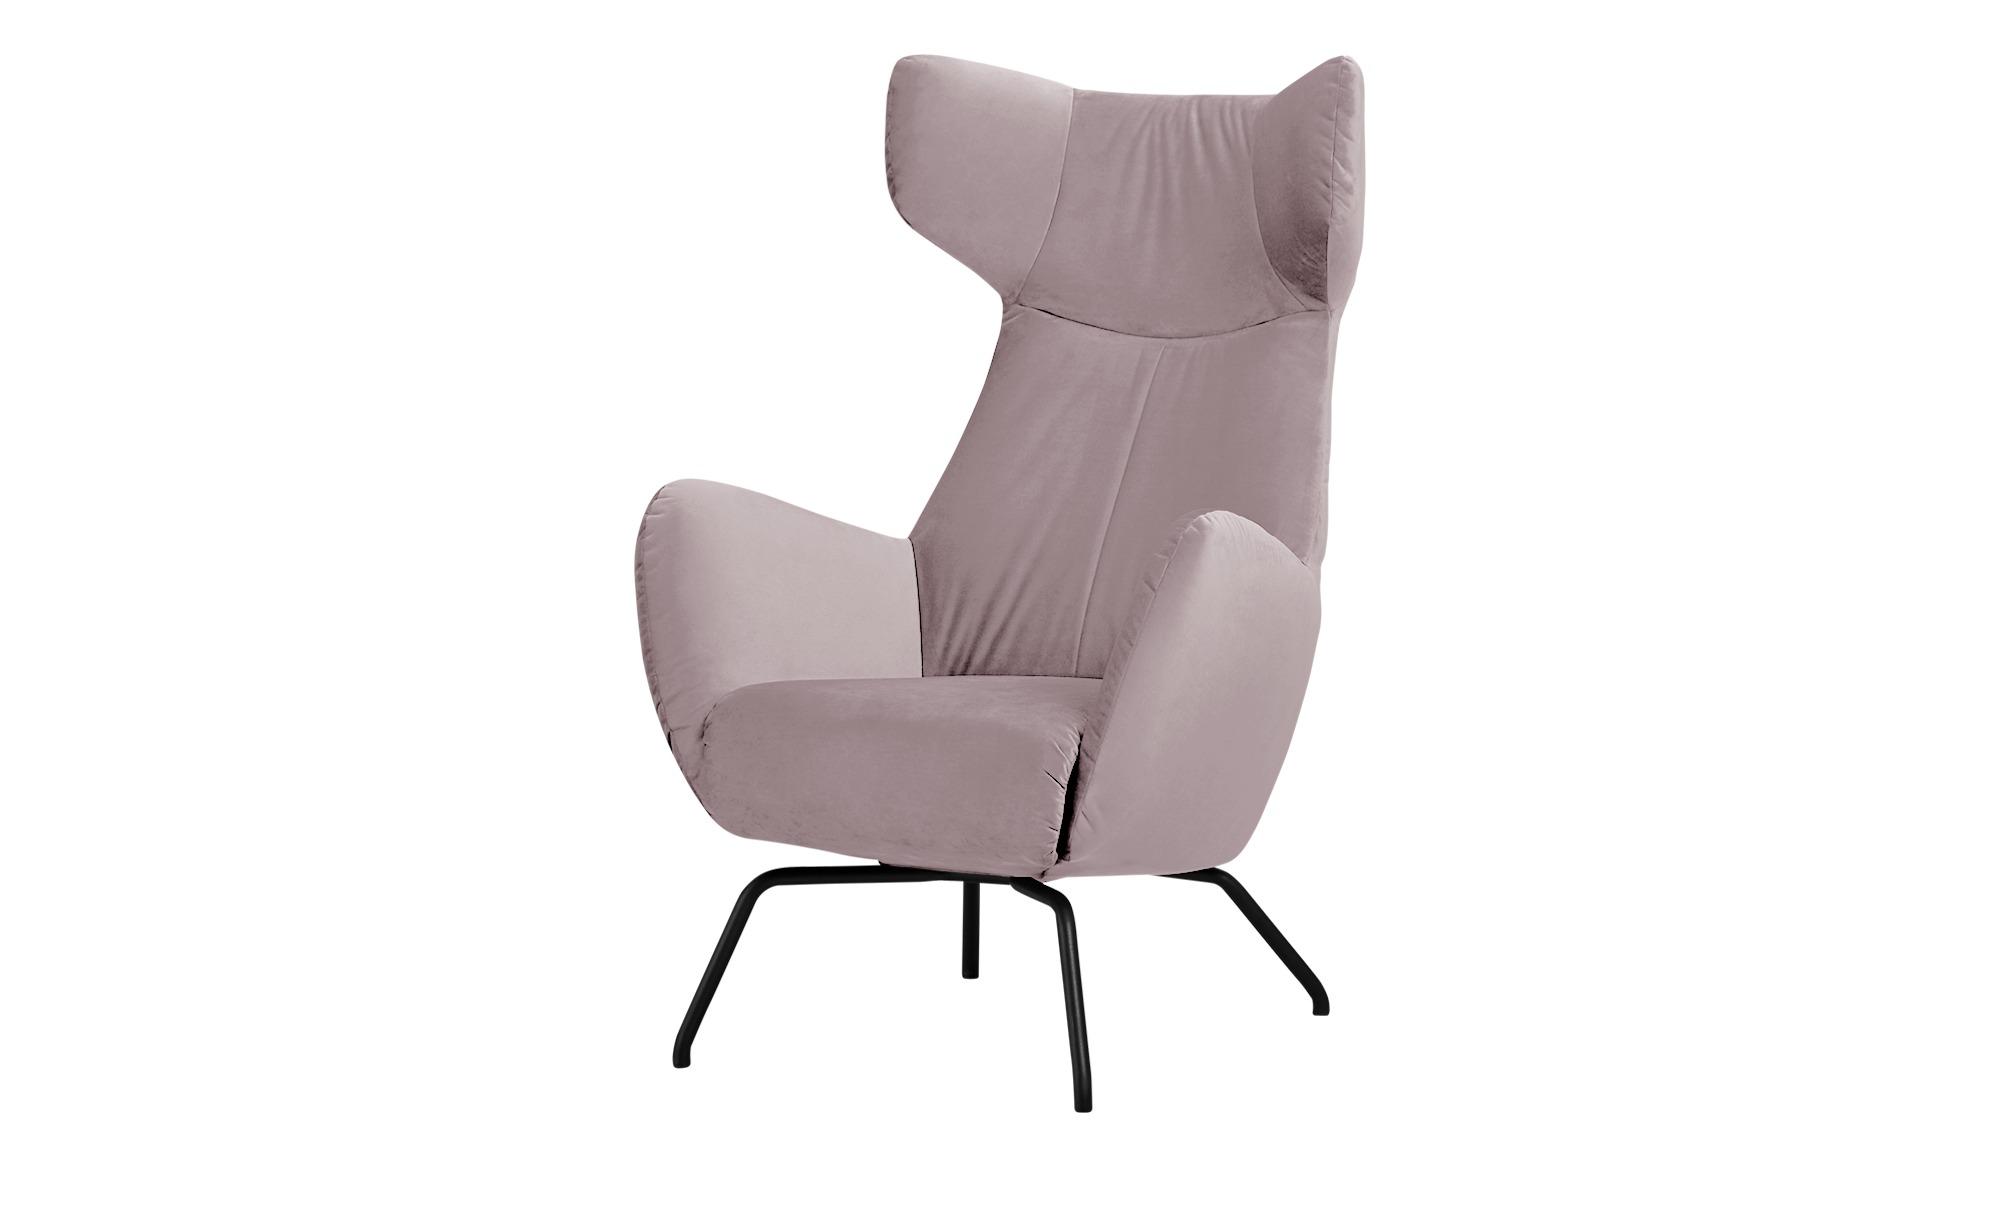 Sessel  Corelli ¦ rosa/pink ¦ Maße (cm): B: 79 H: 117 T: 82 Polstermöbel > Sessel > Polstersessel - Höffner